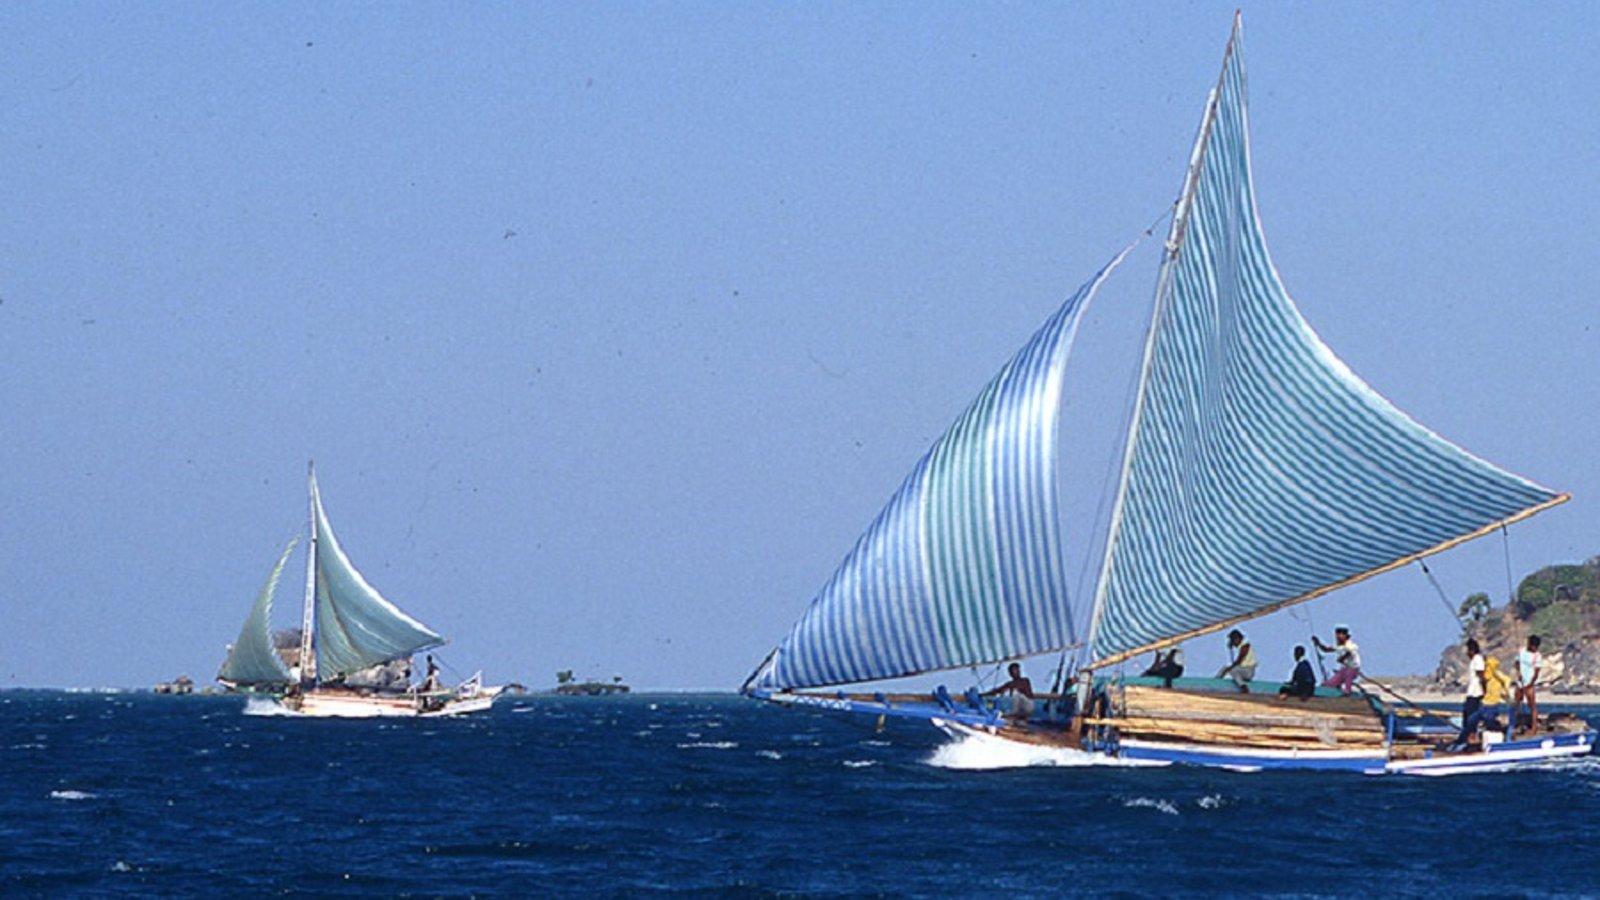 Below the Wind - Fishing in Indonesia